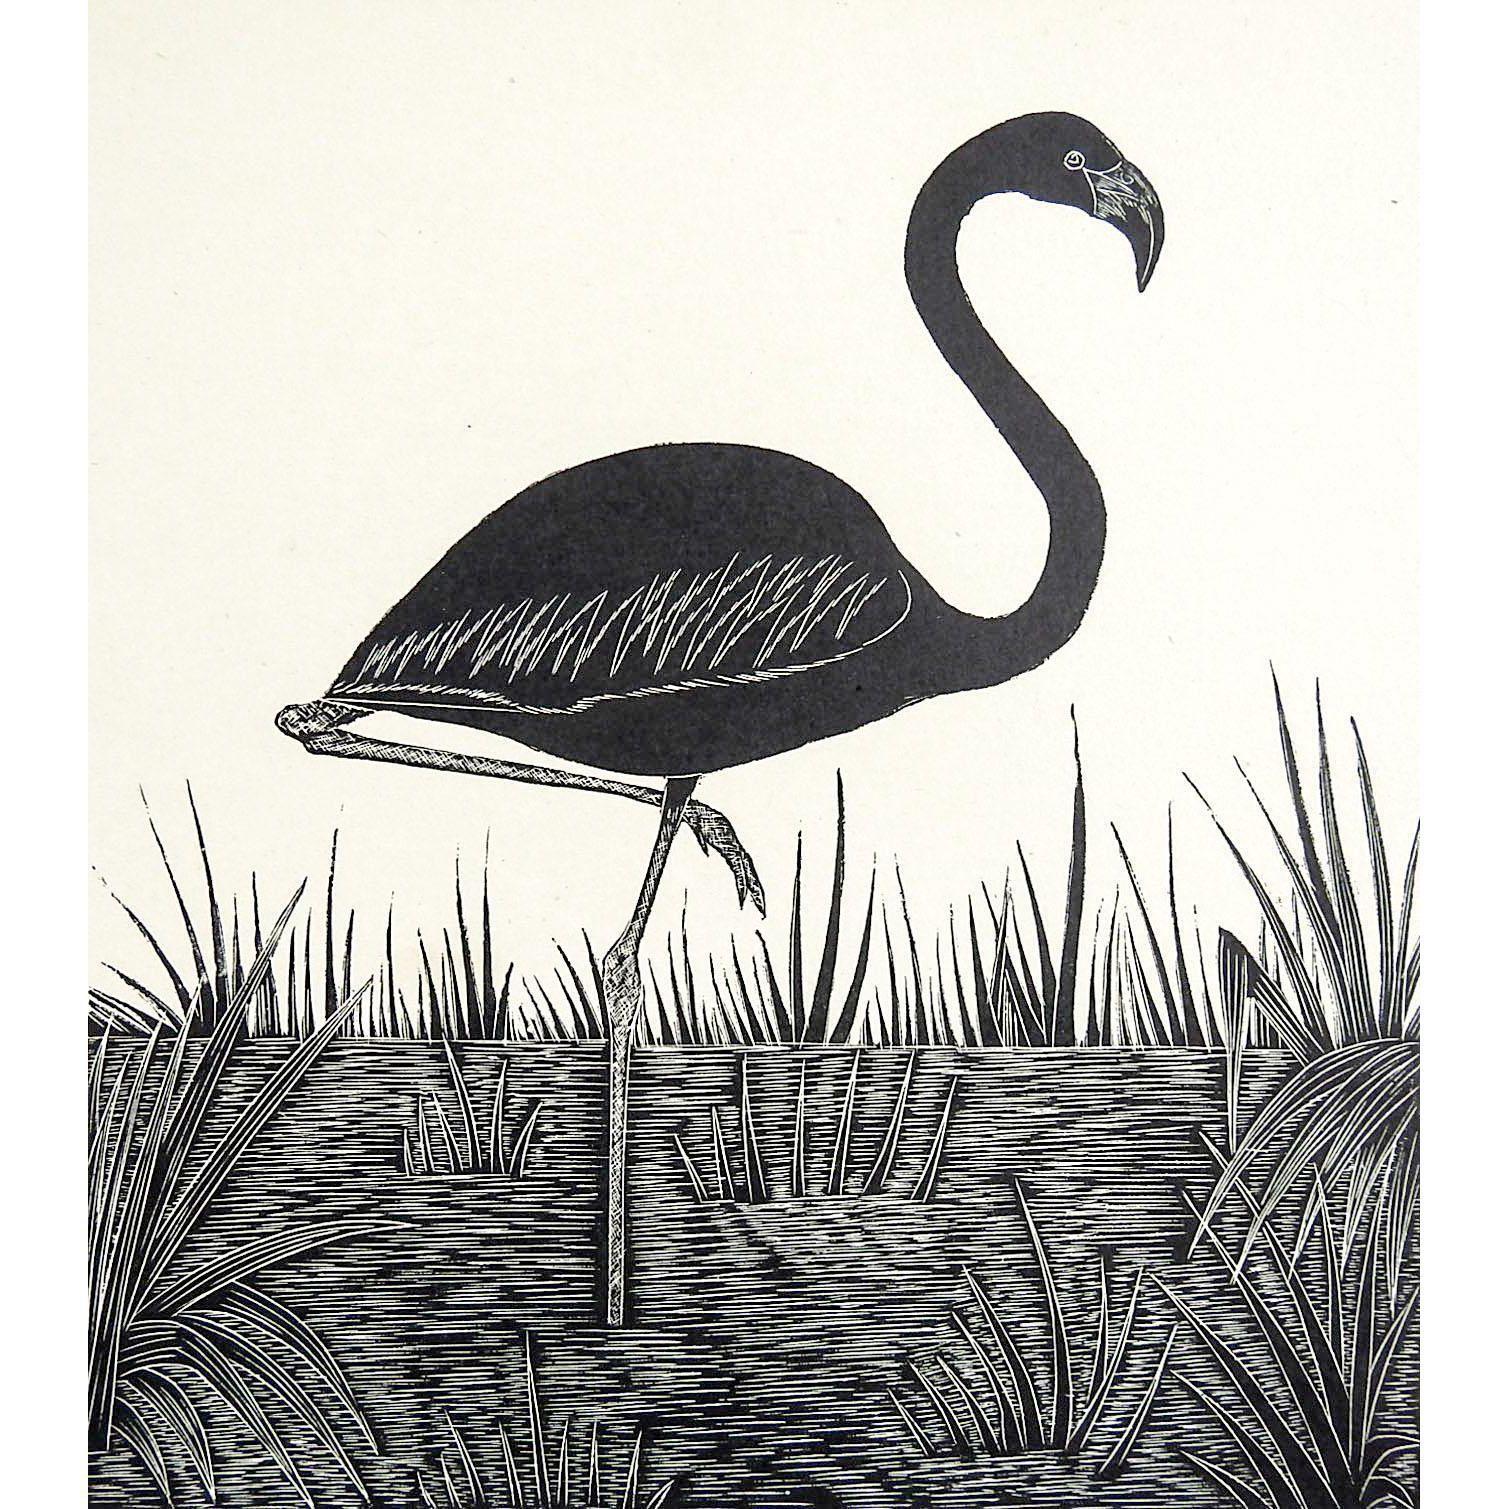 Flamingo Block Print Illustration Image 4 of 4